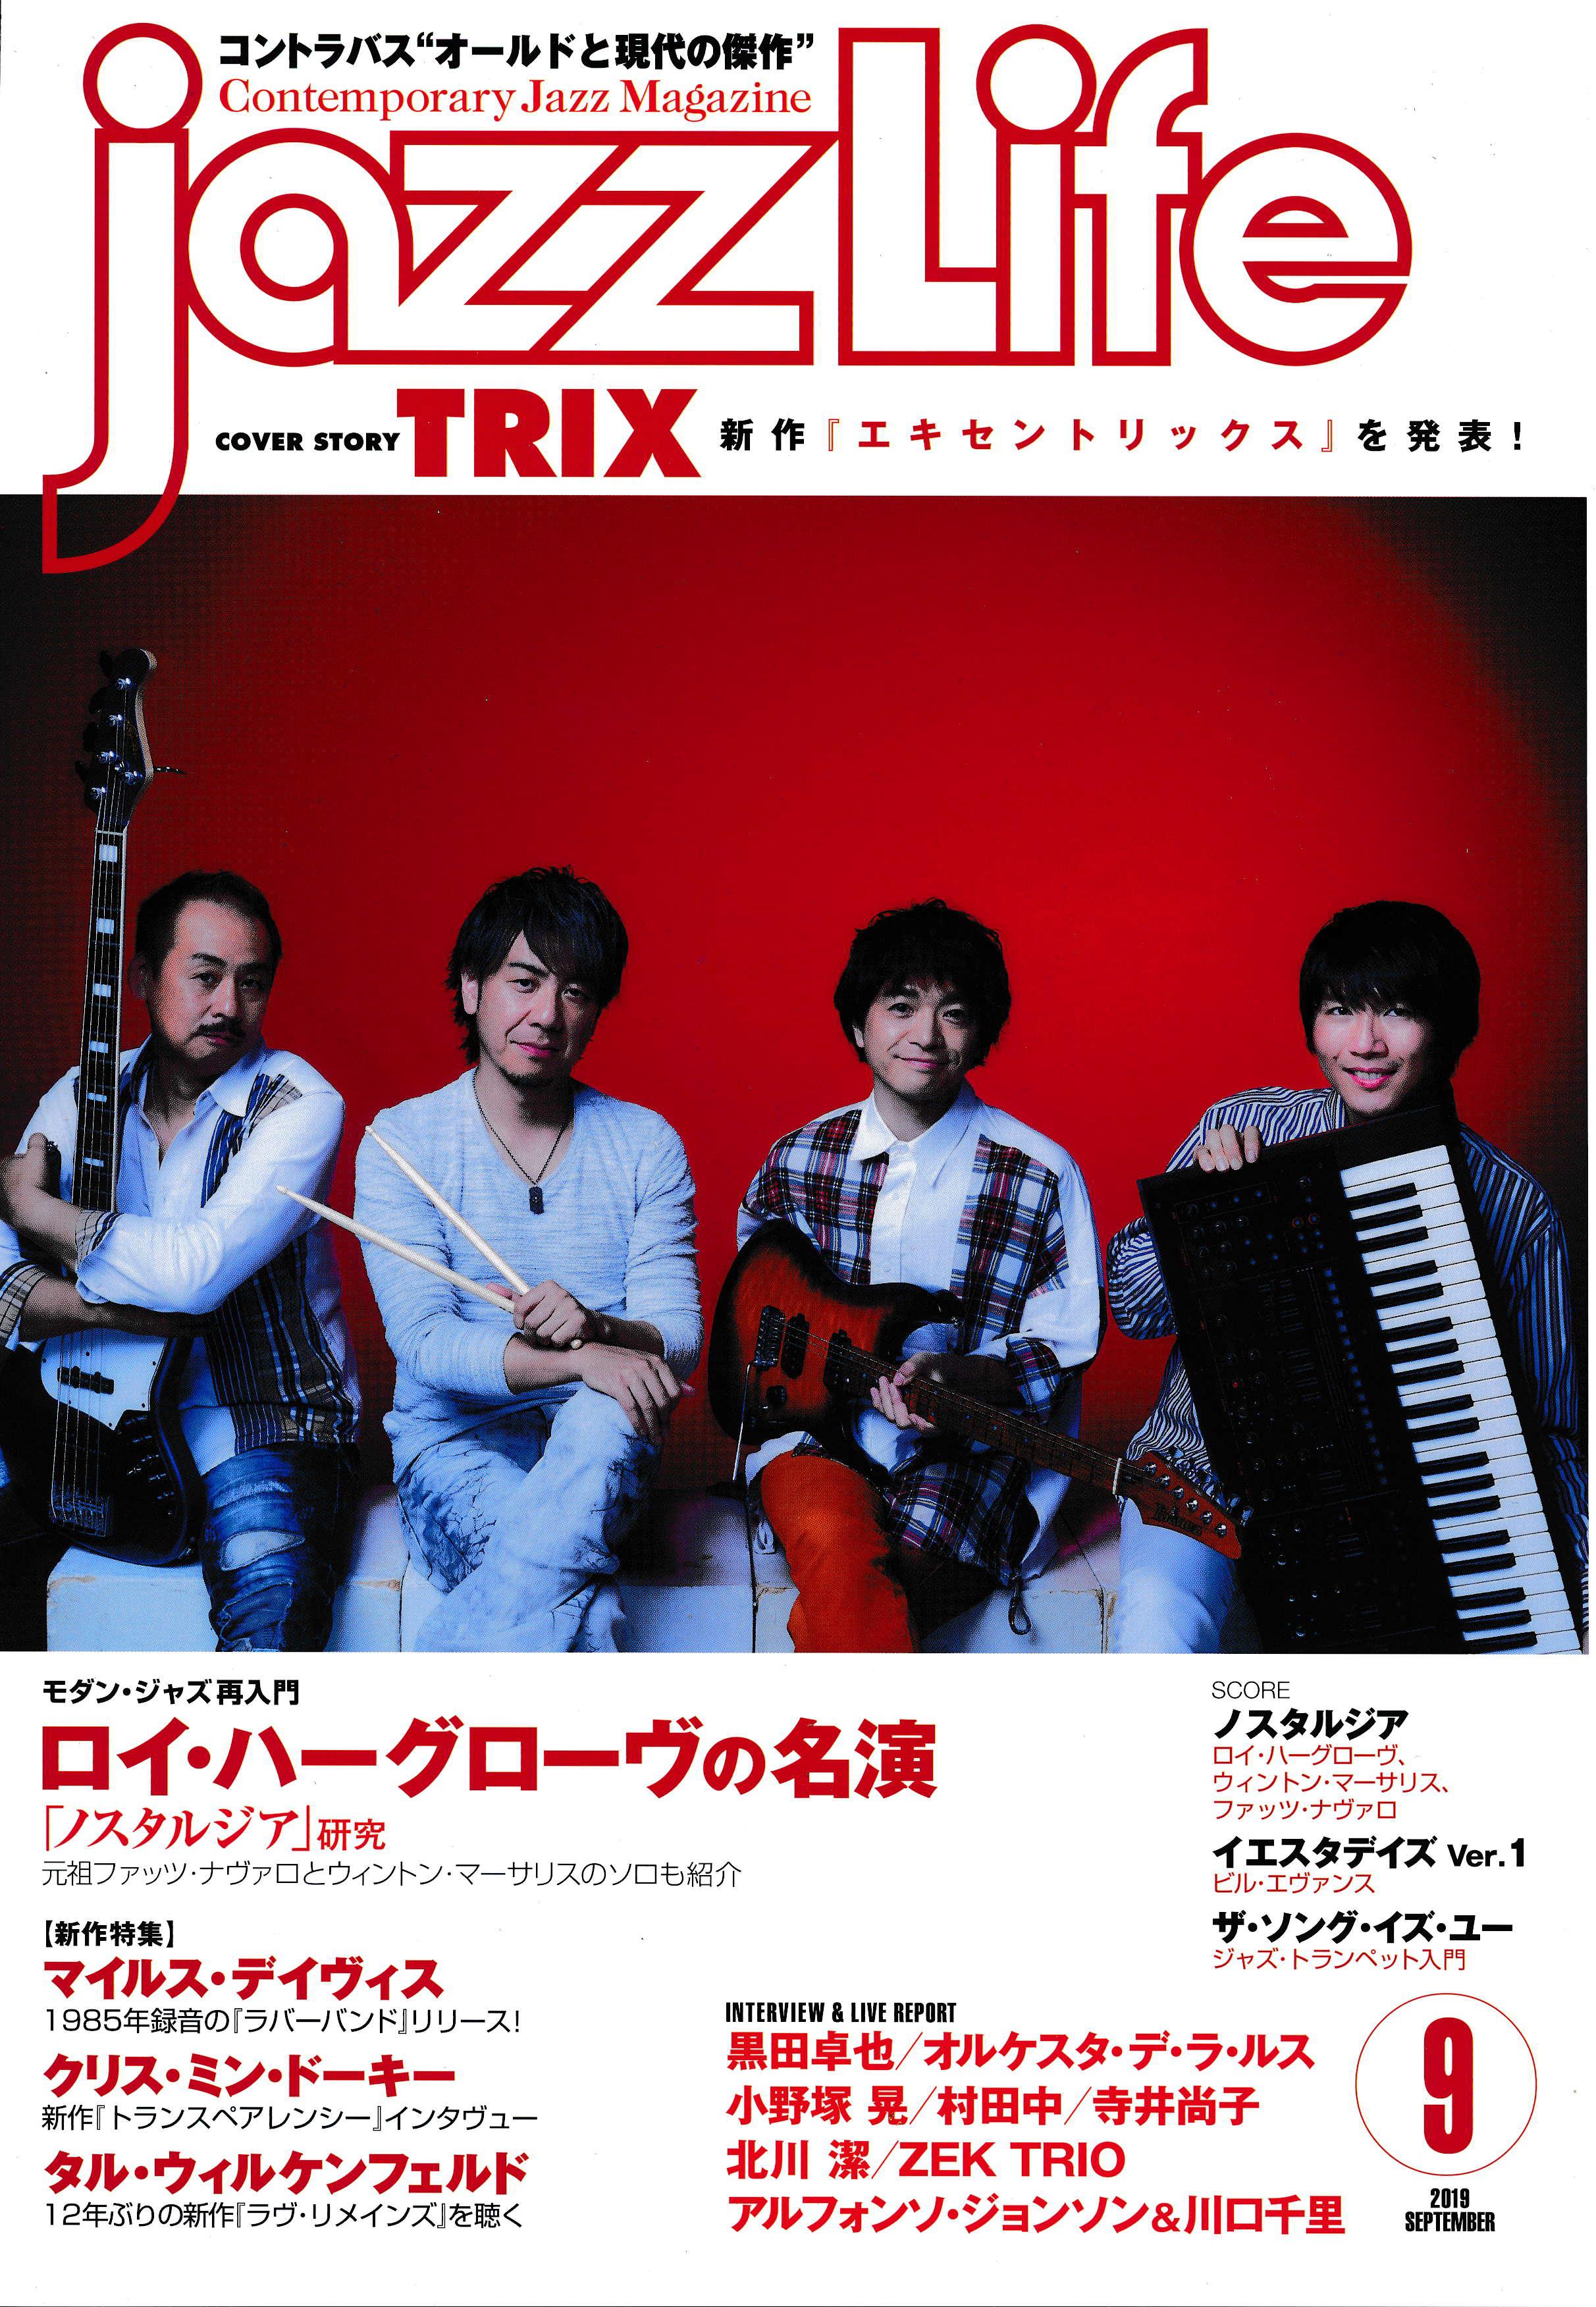 JAZZ LIFE: Japan's Jazz Life Reviews Lauren Desberg's Shows/Clark Gibson/Ralph Peterson